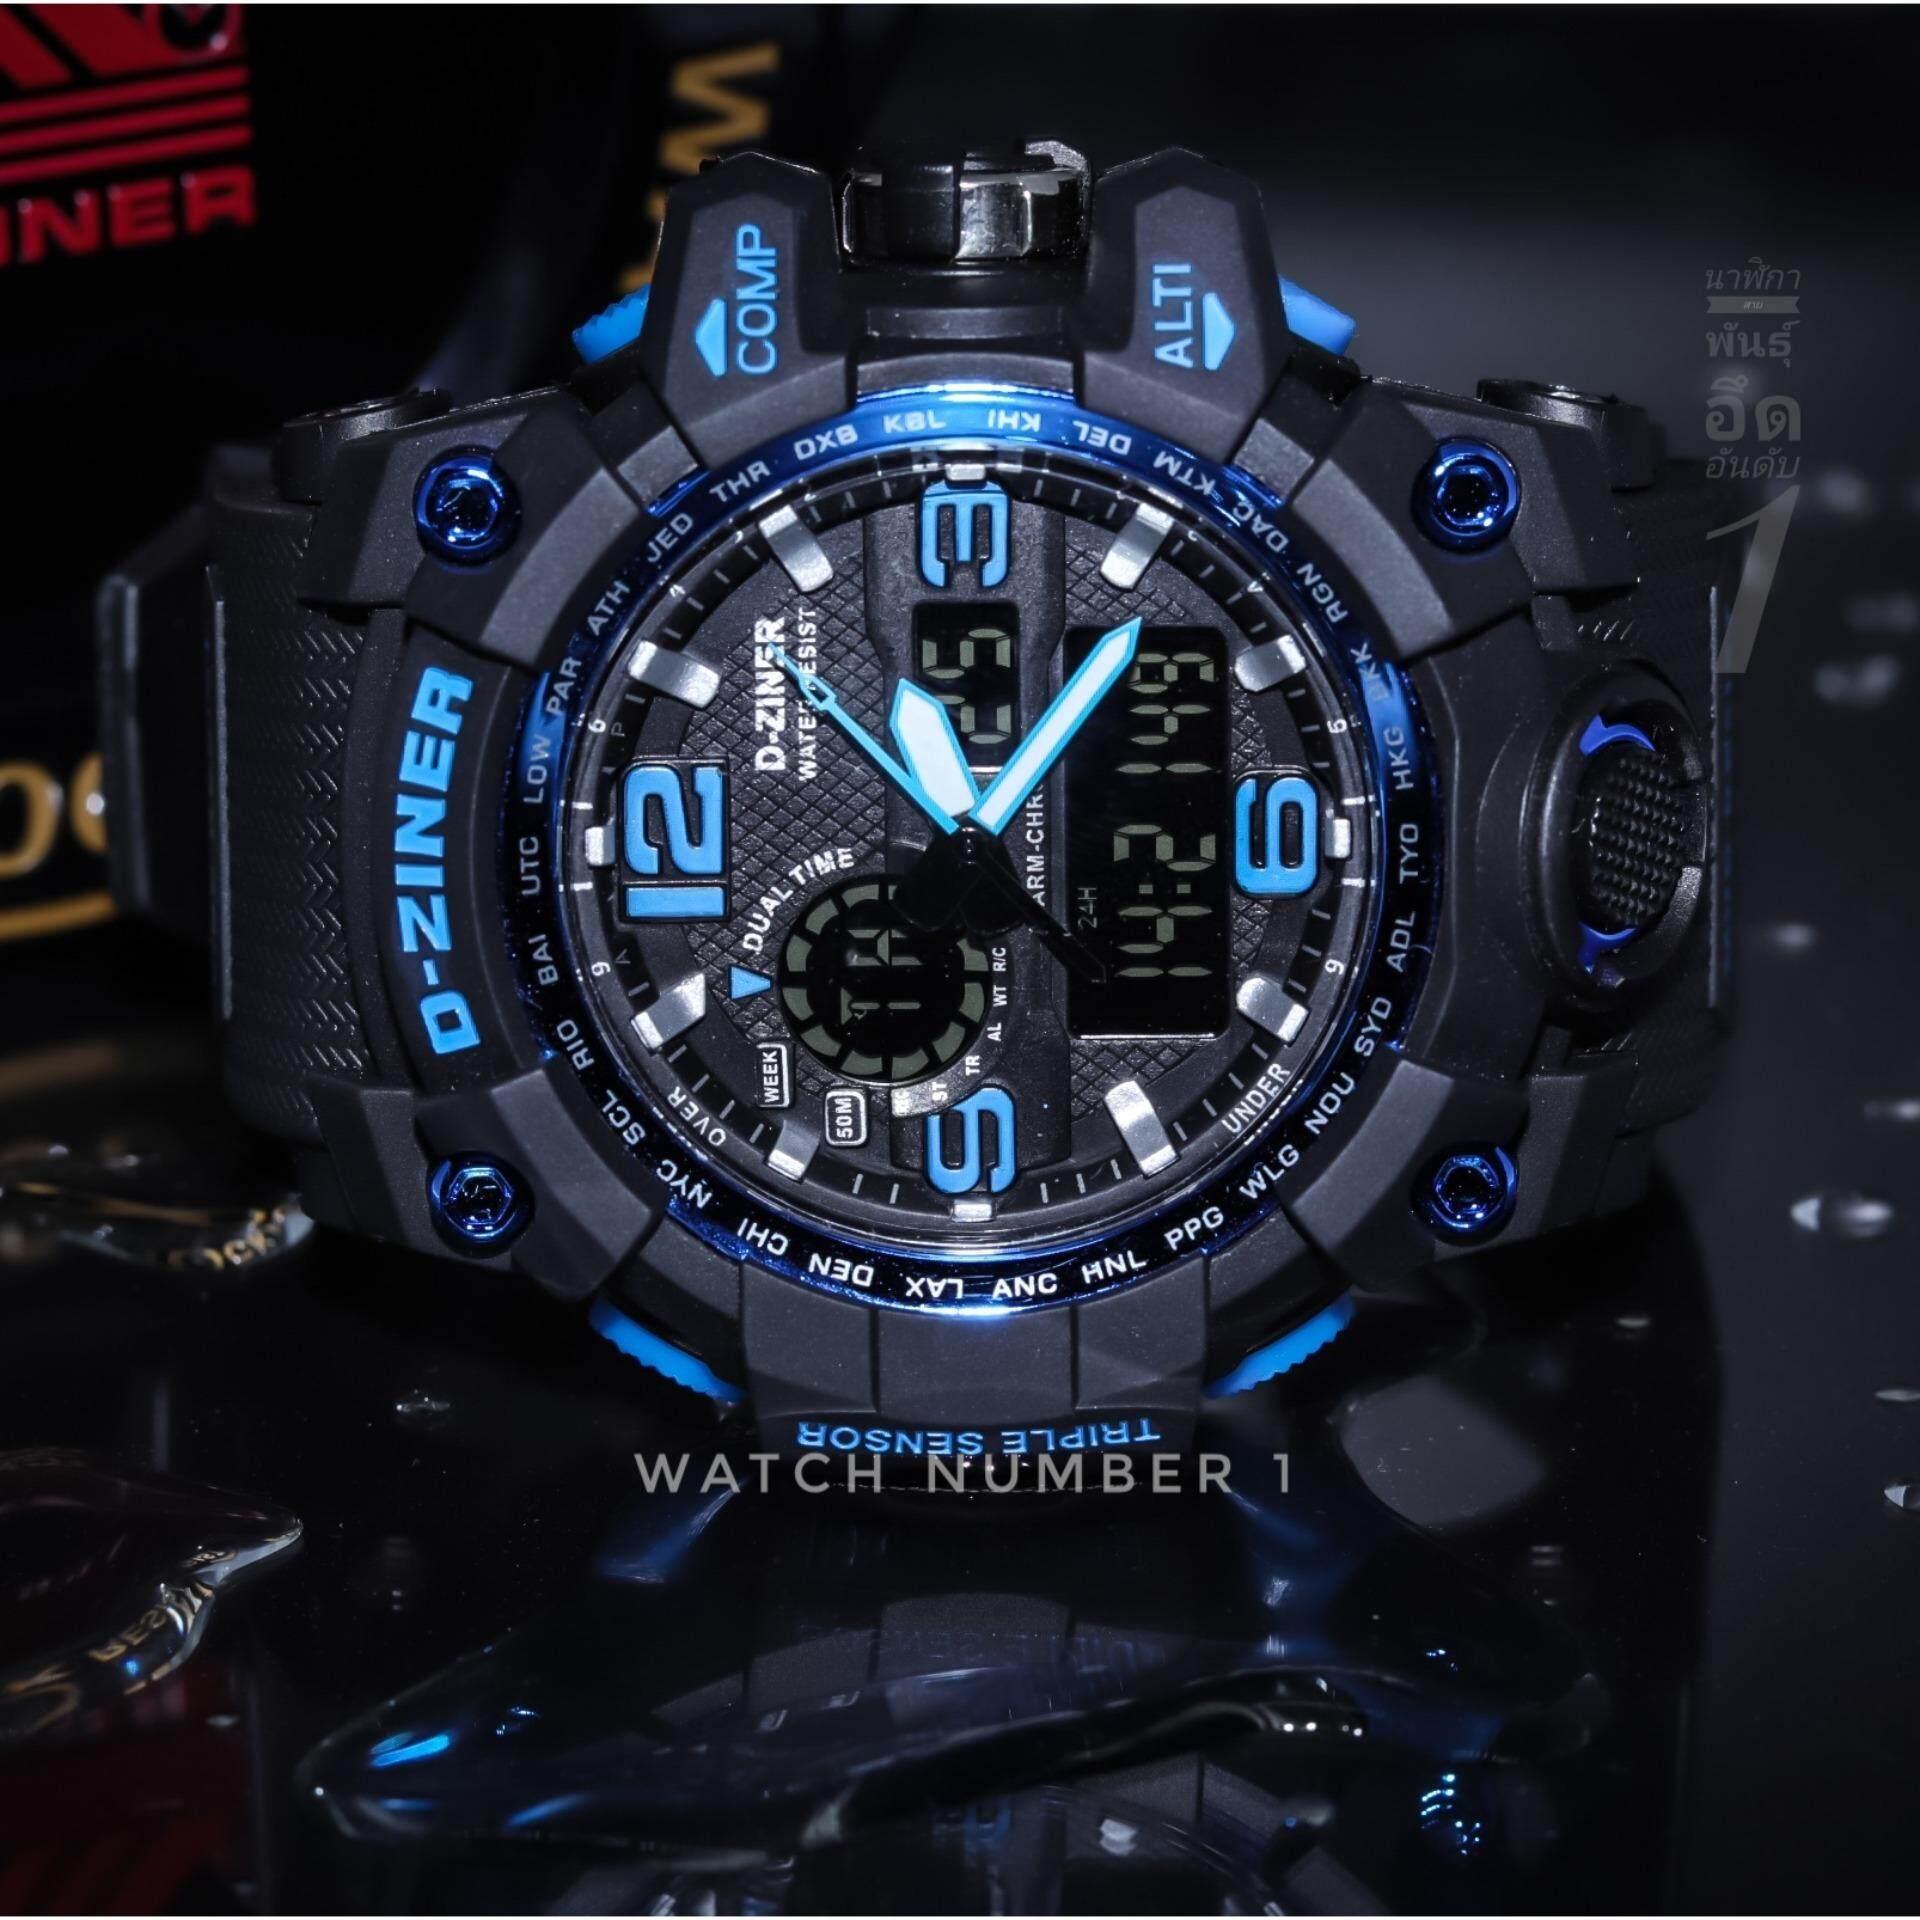 D-ZINER นาฬิกาผู้ชายสุดแกร่ง รุ่นใหม่ ผลิตปี 2019 กันน้ำ พร้อมกล่องเหล็กอย่างดี